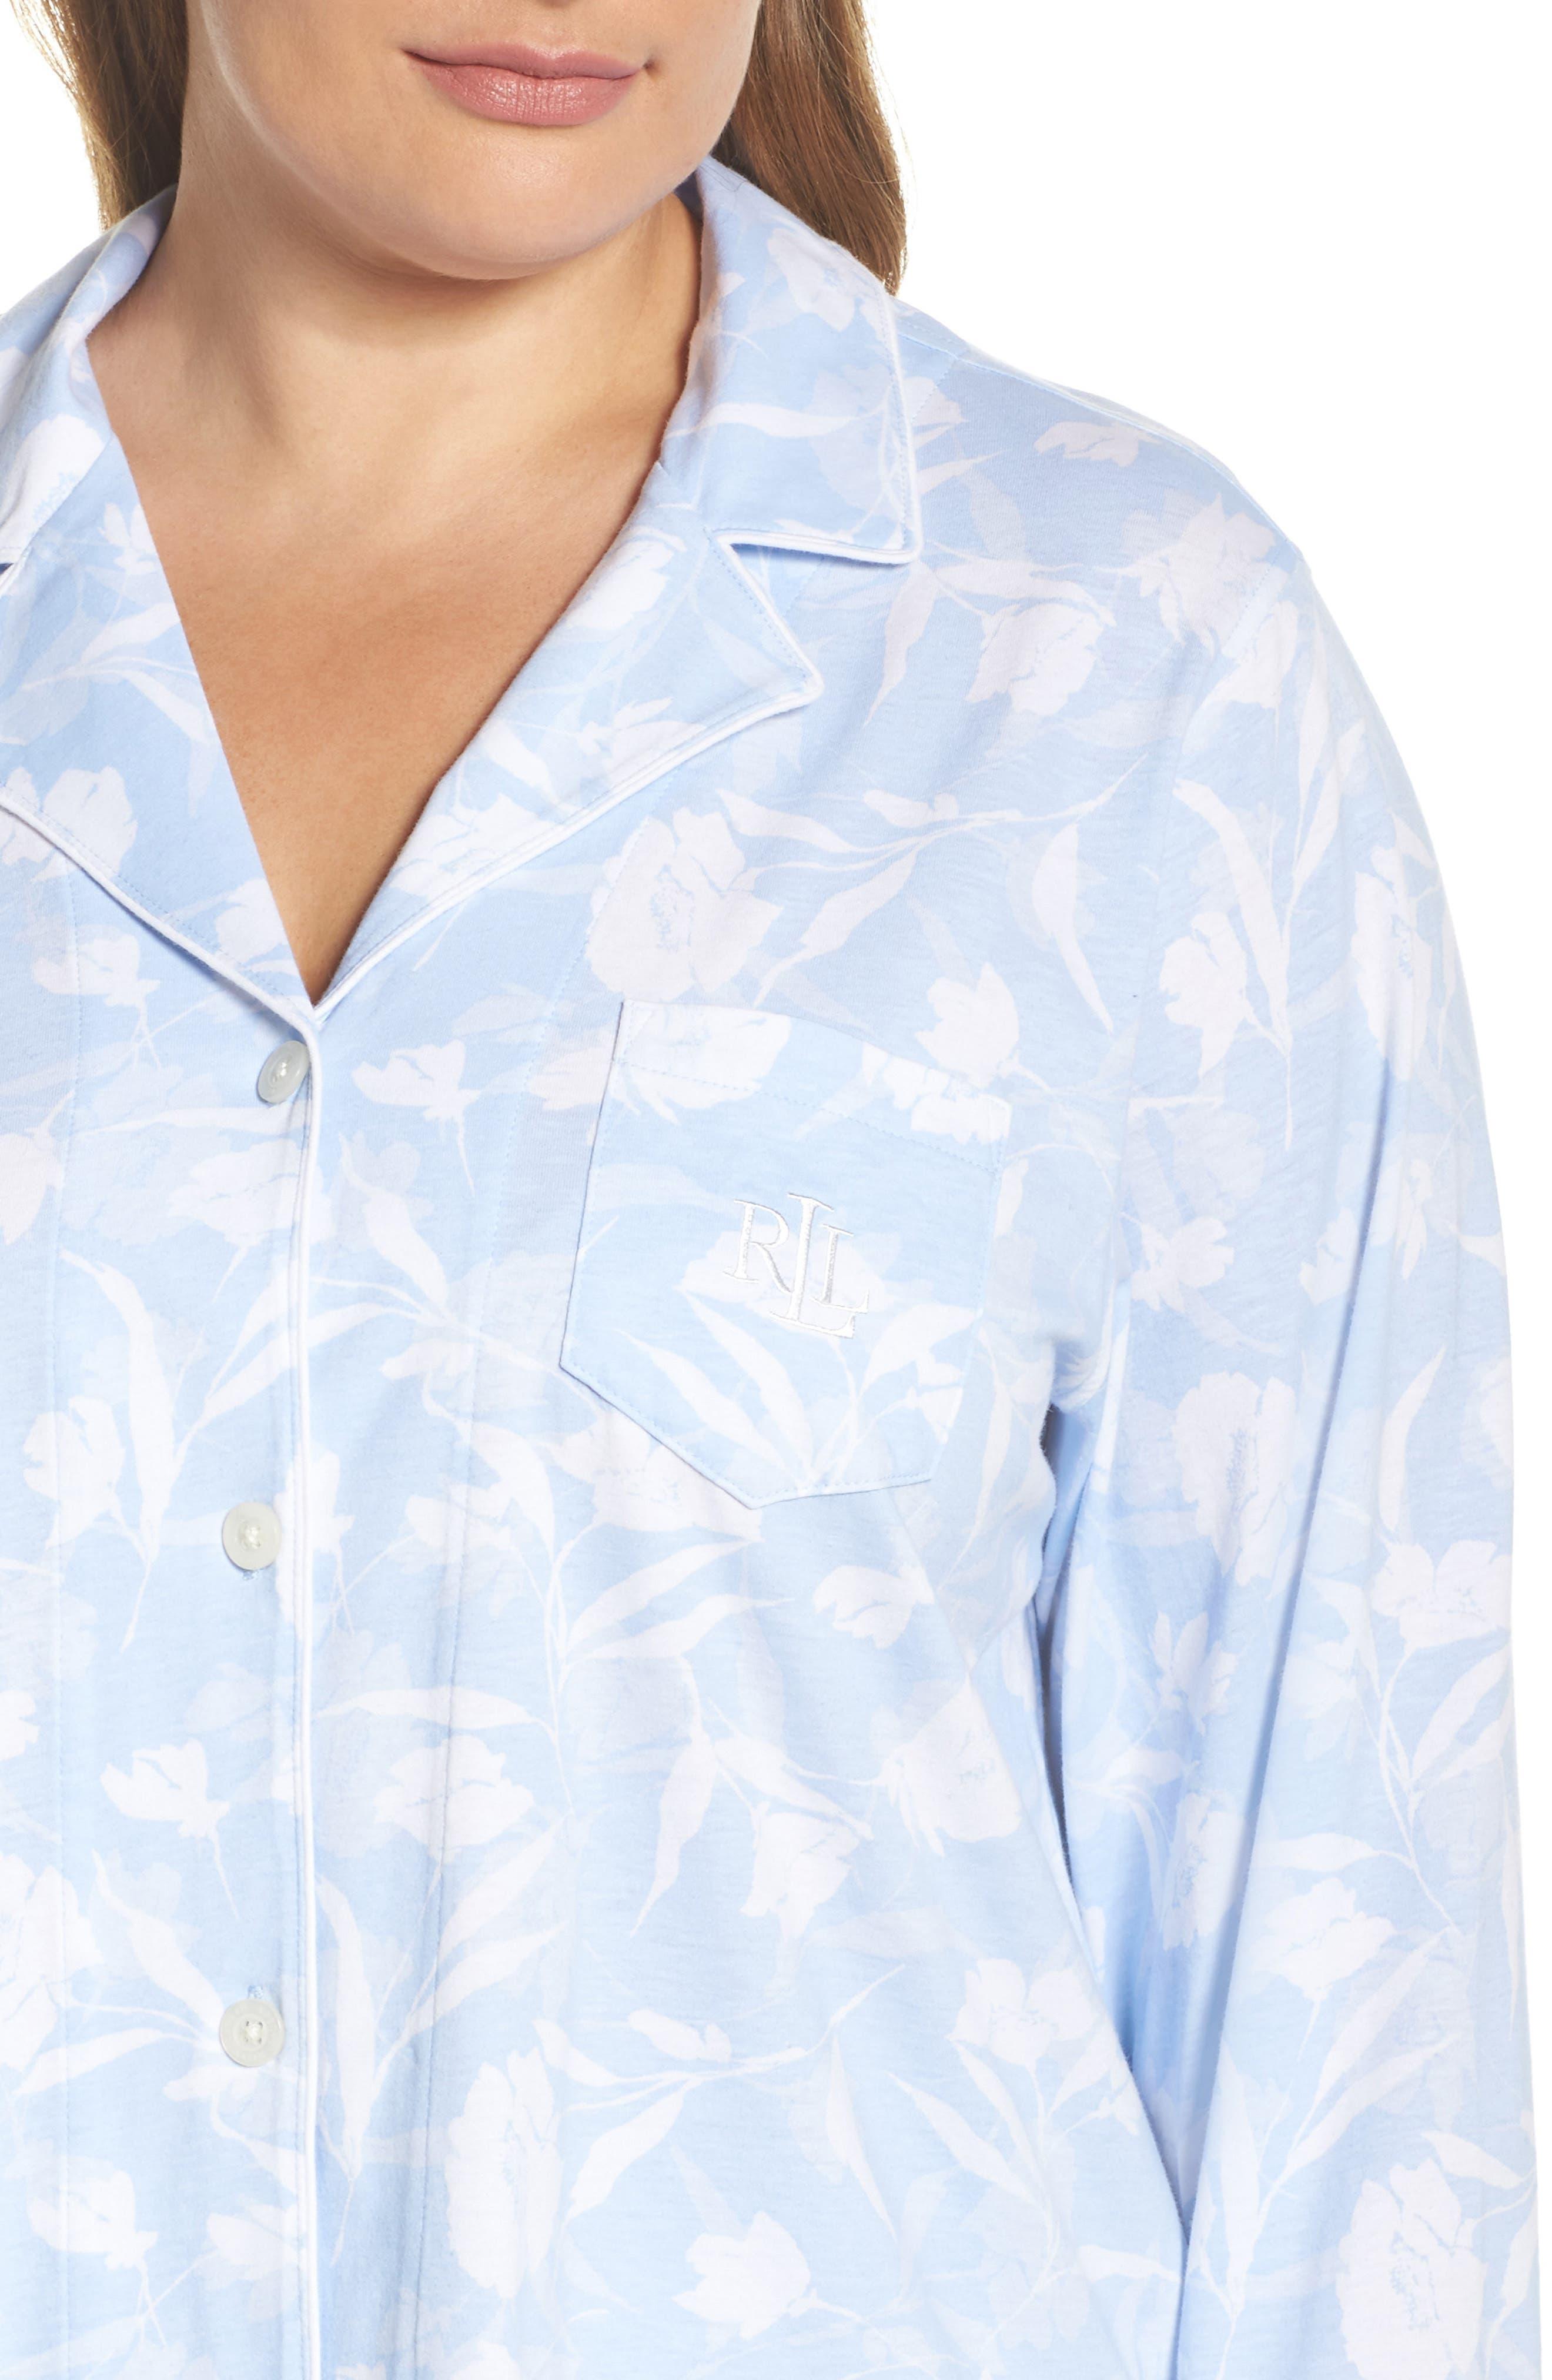 Floral Print Jersey Pajamas,                             Alternate thumbnail 4, color,                             Blue Monotone Floral